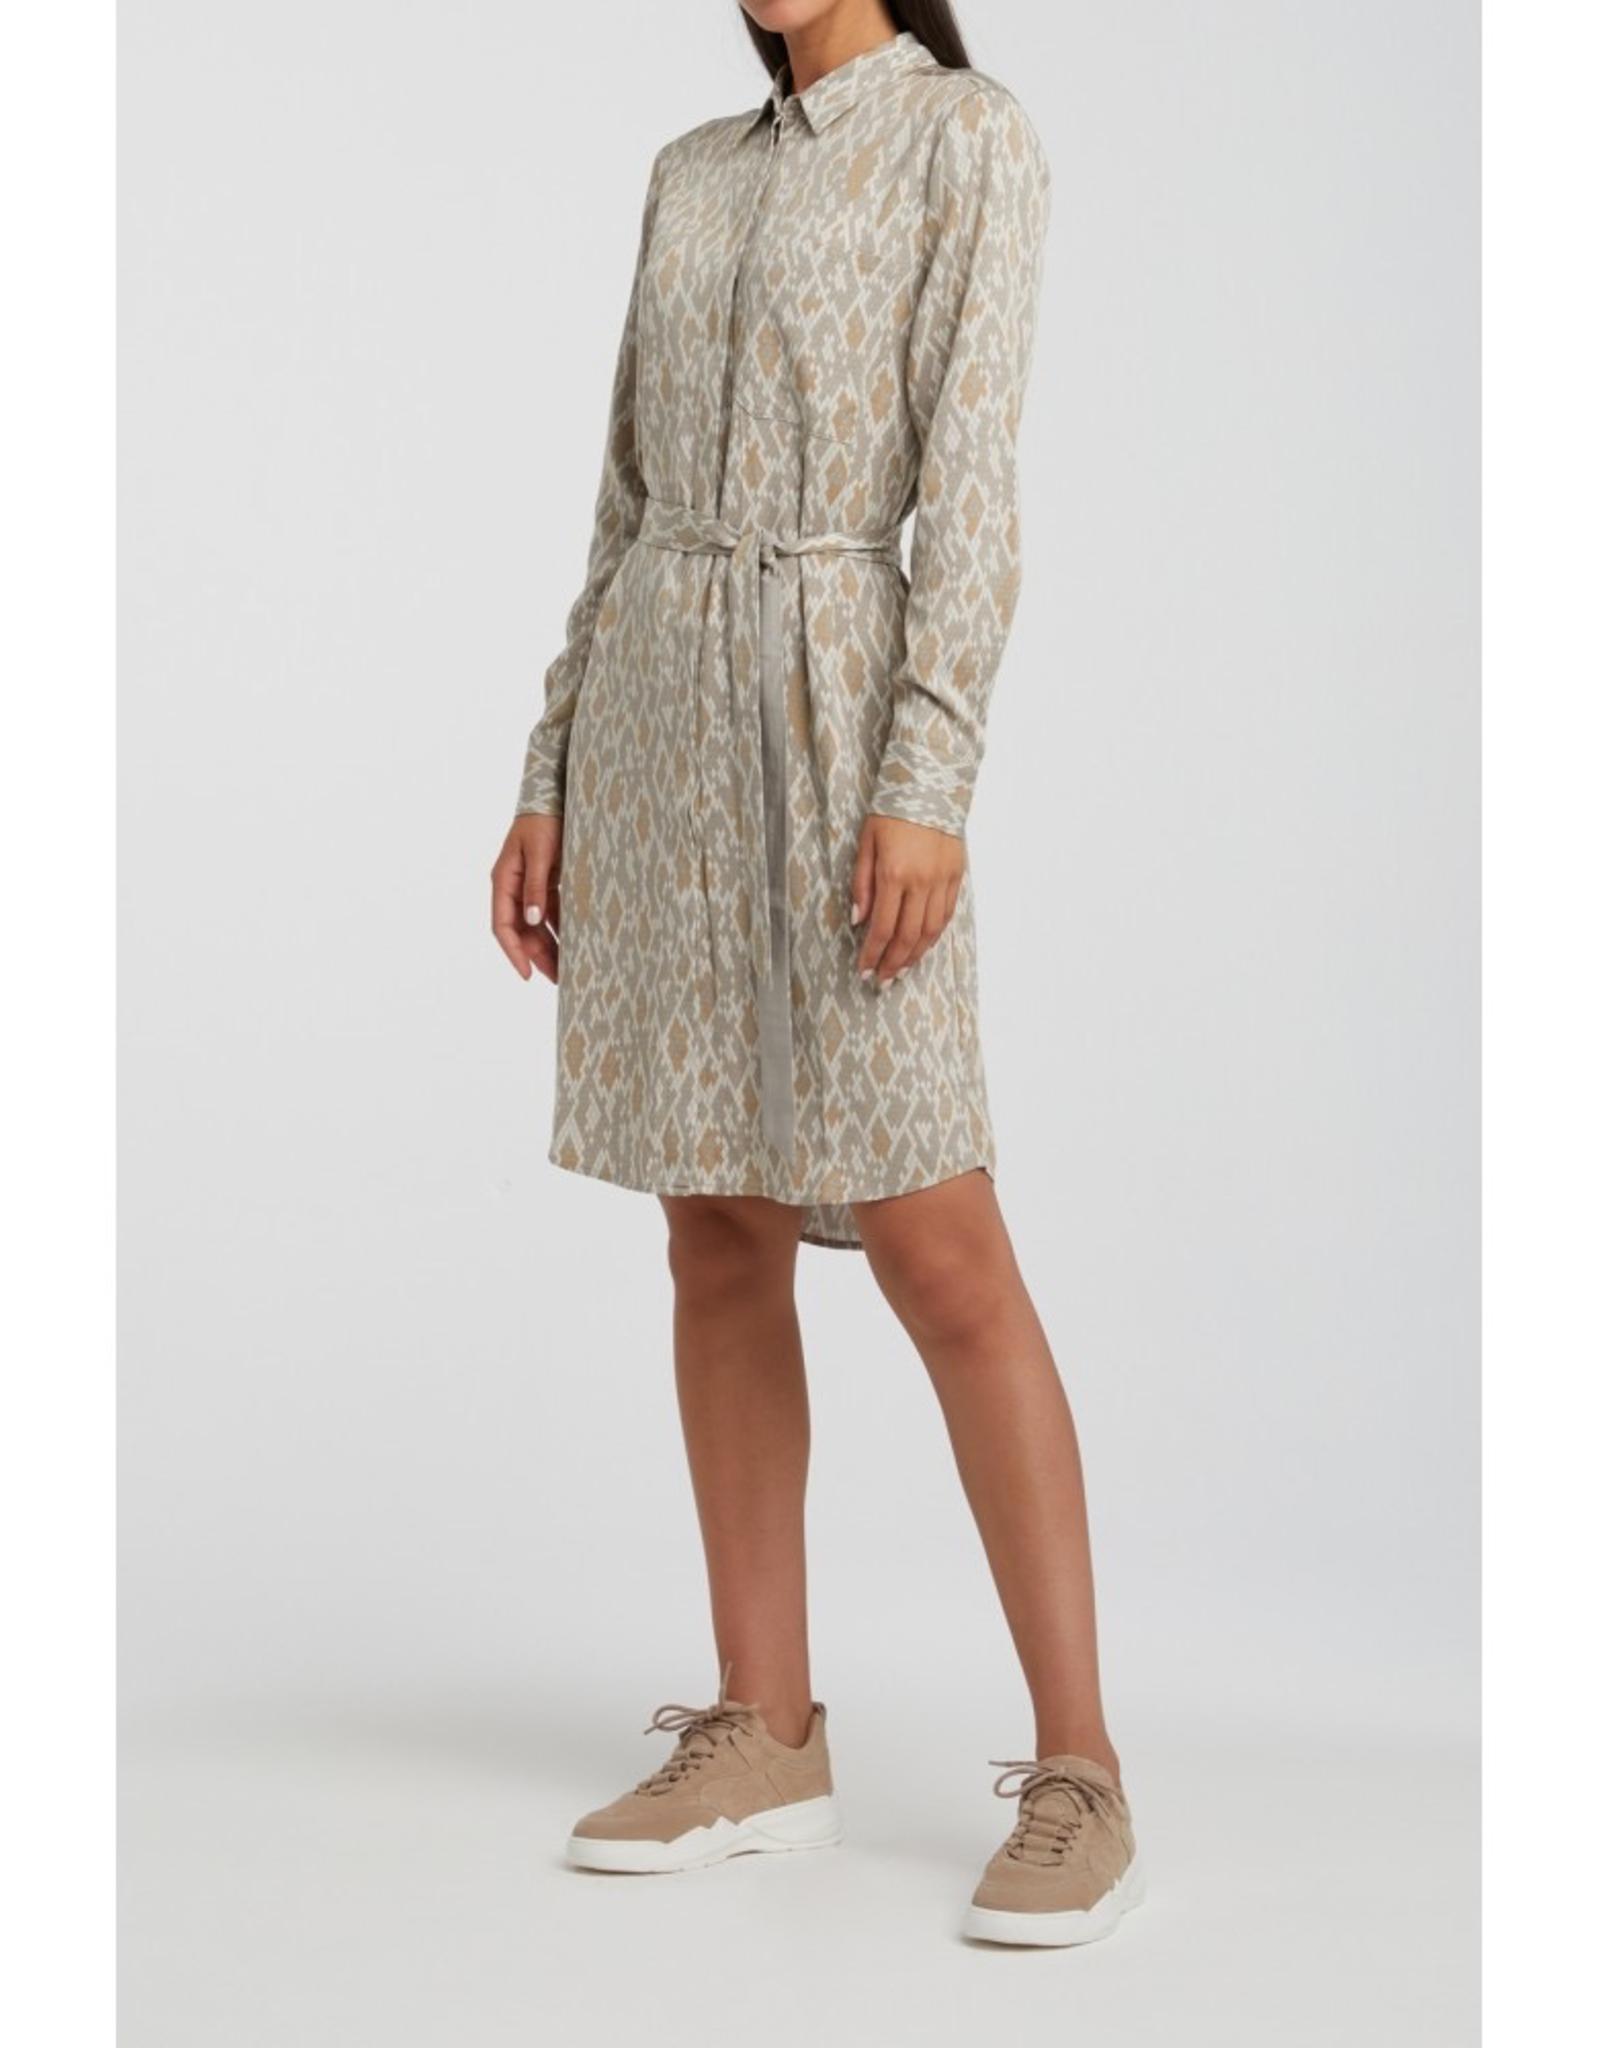 YAYA Blouse Dress w Belt In Light Sand Snake Print